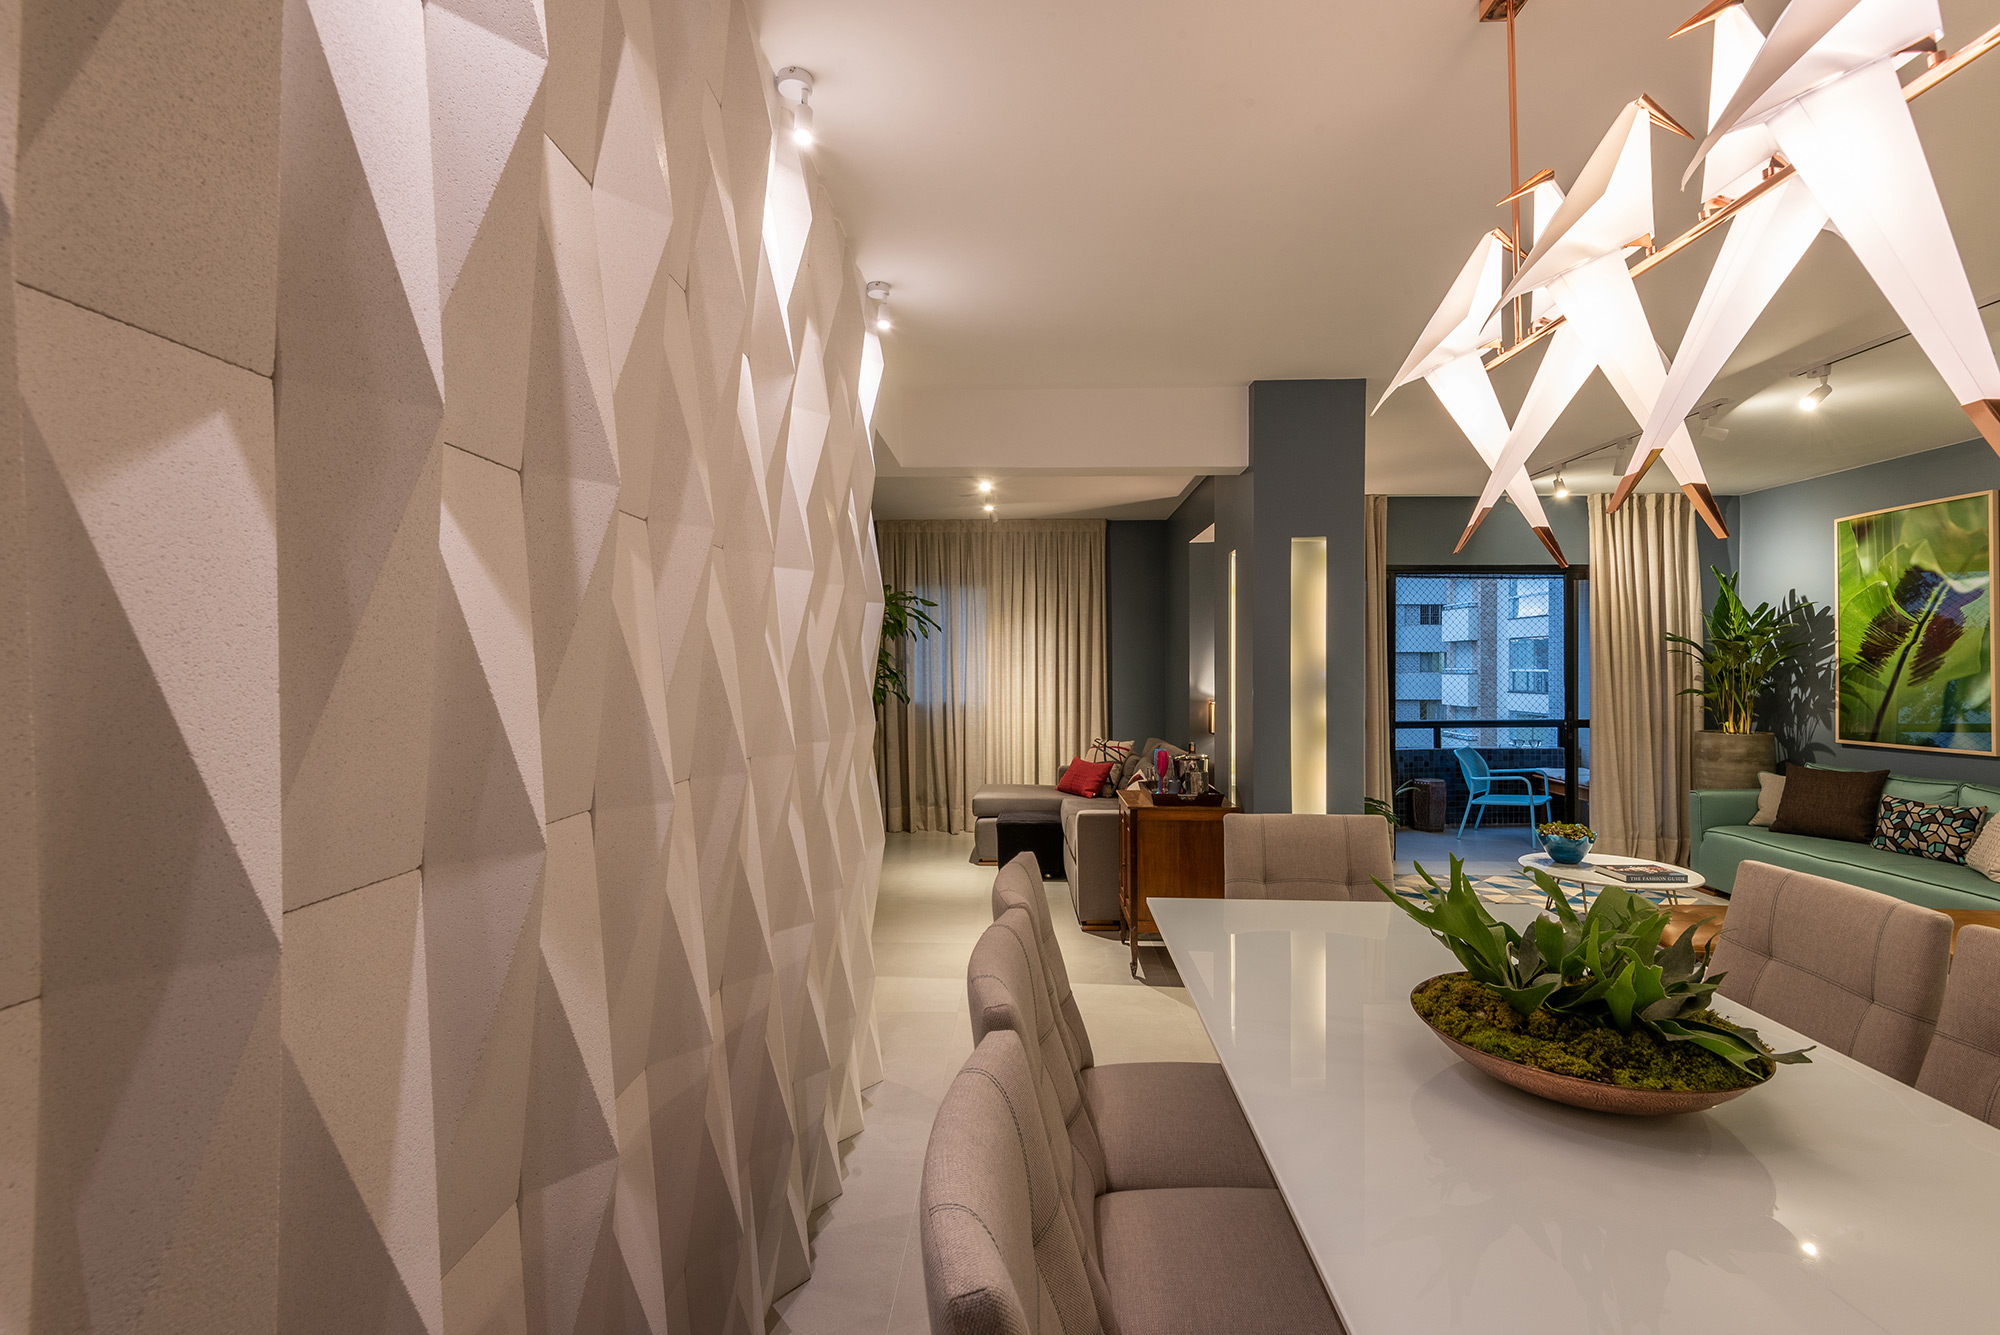 Origami Branco - Designer de Interiores Henrique Freneda - Foto Favaro Jr.